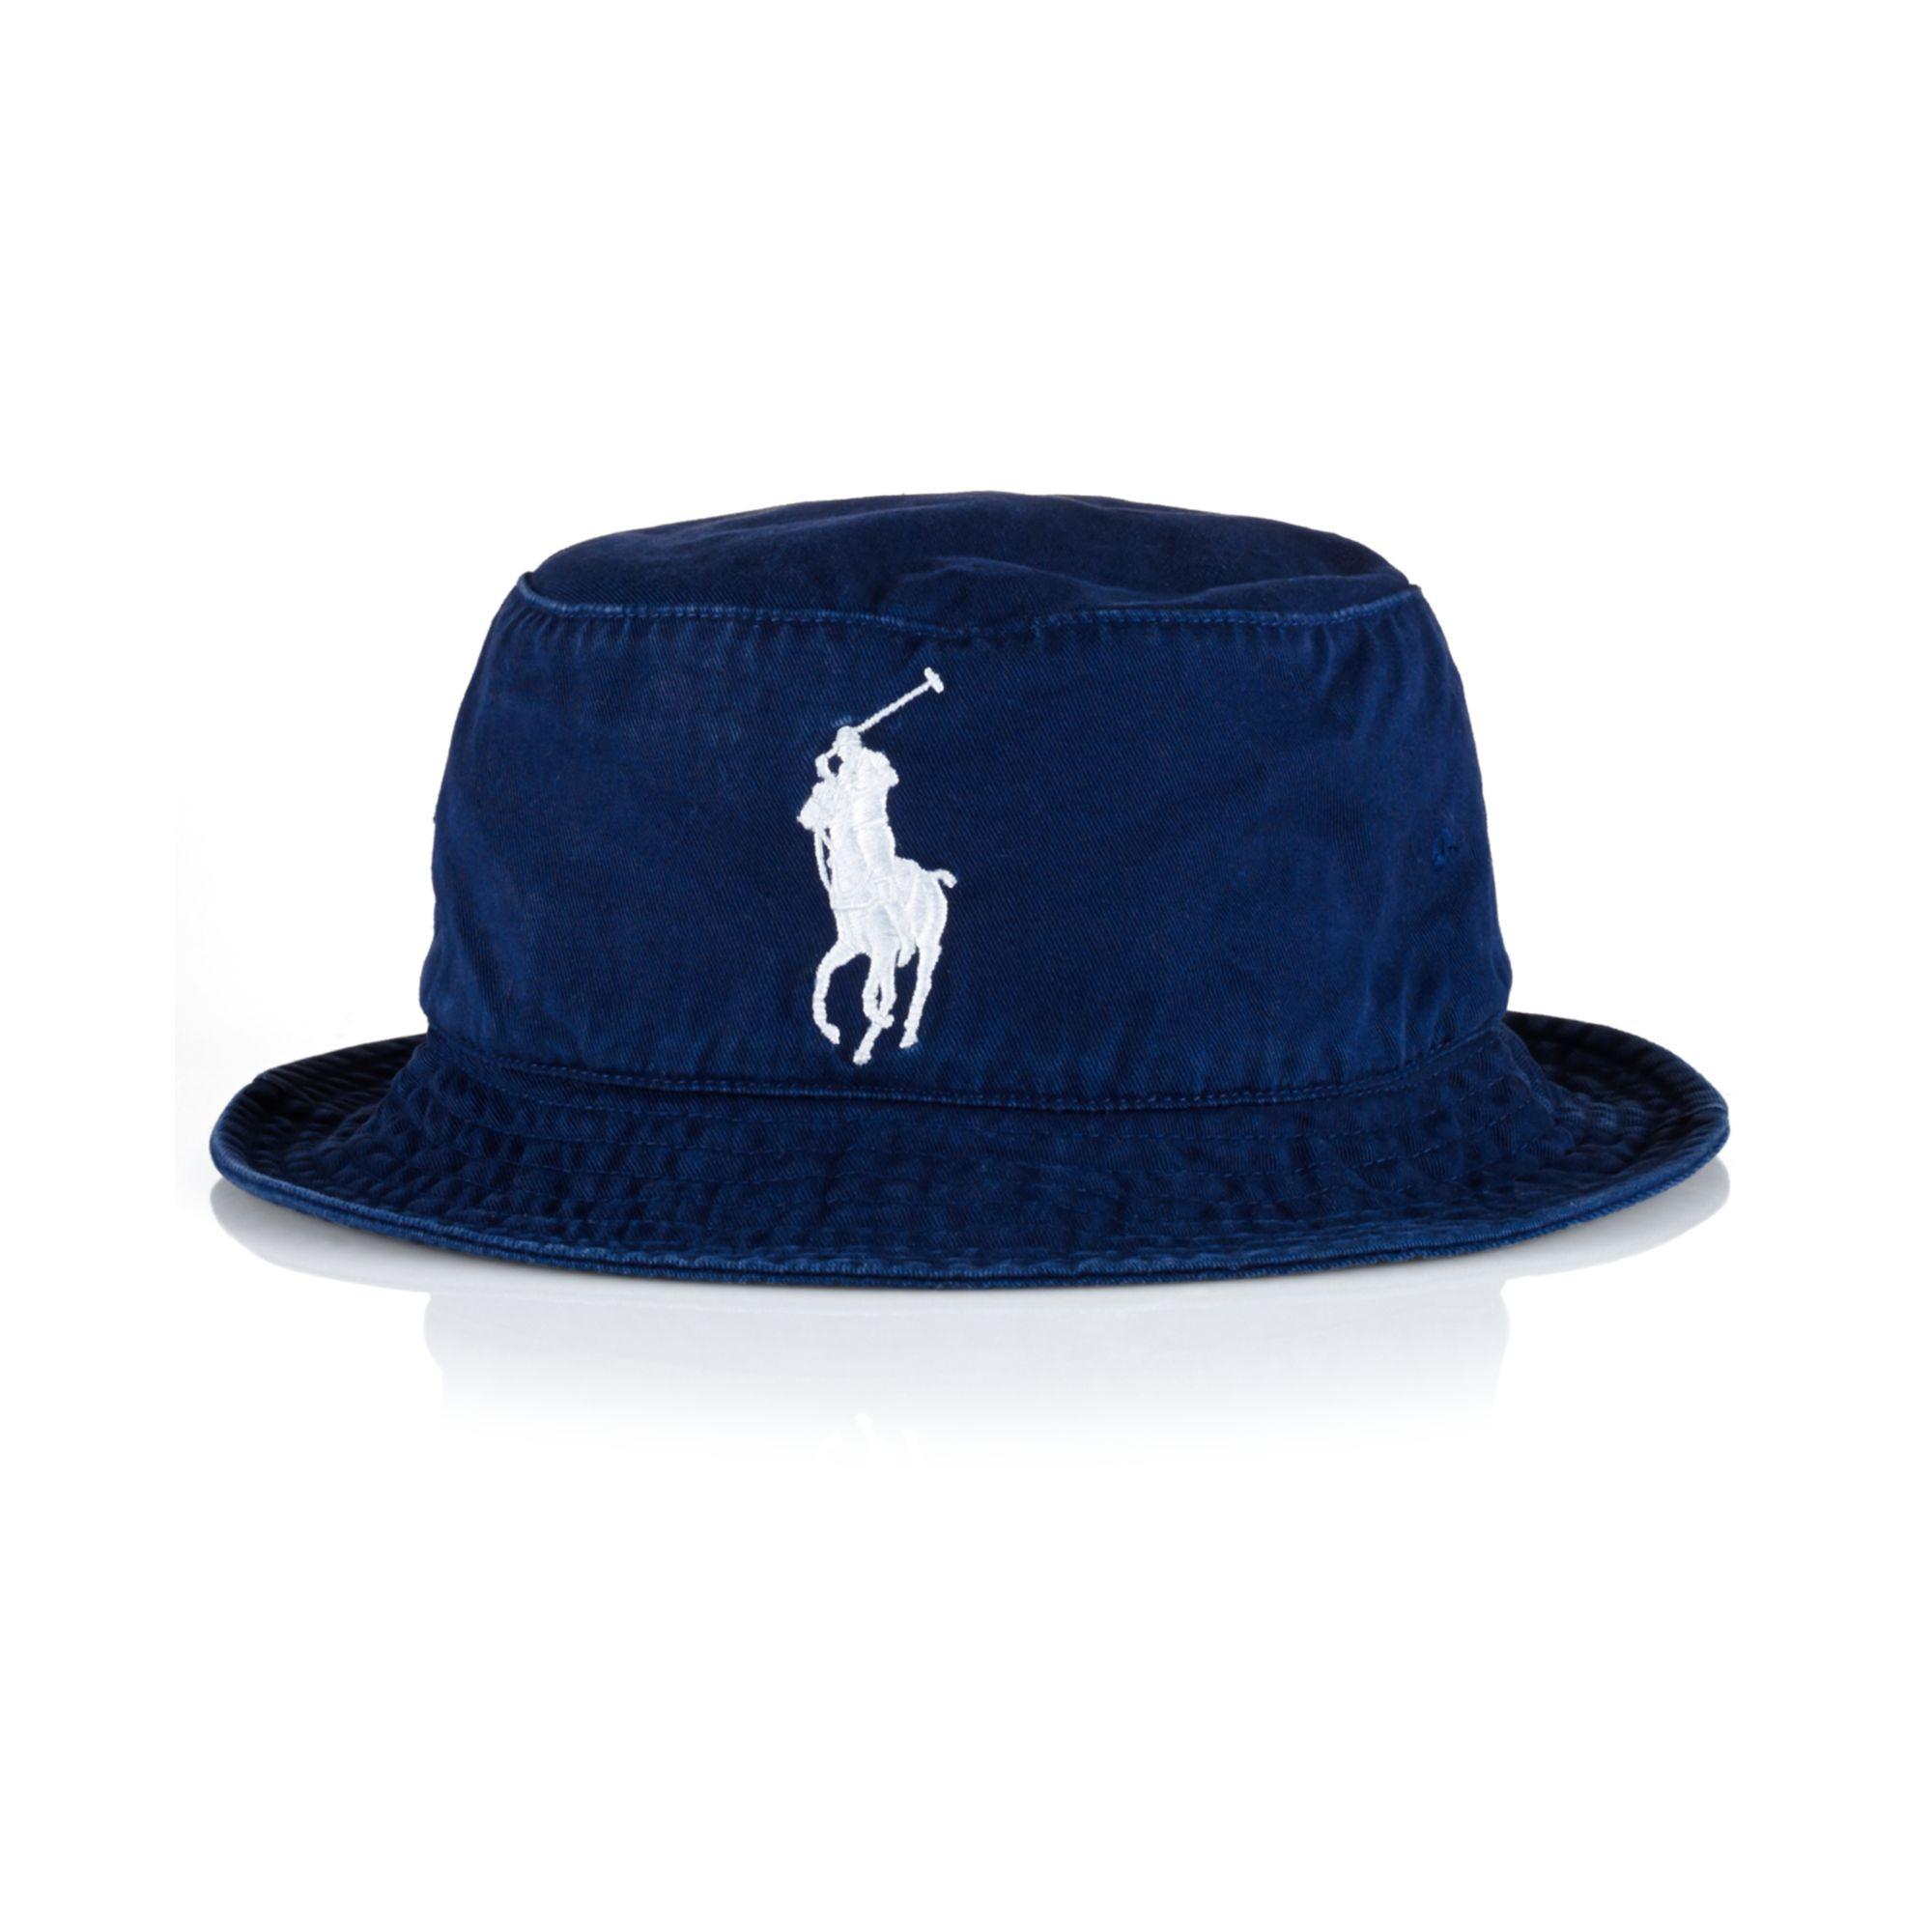 db2d441e211 Polo Ralph Lauren Bucket Hat For Men - Hat HD Image Ukjugs.Org